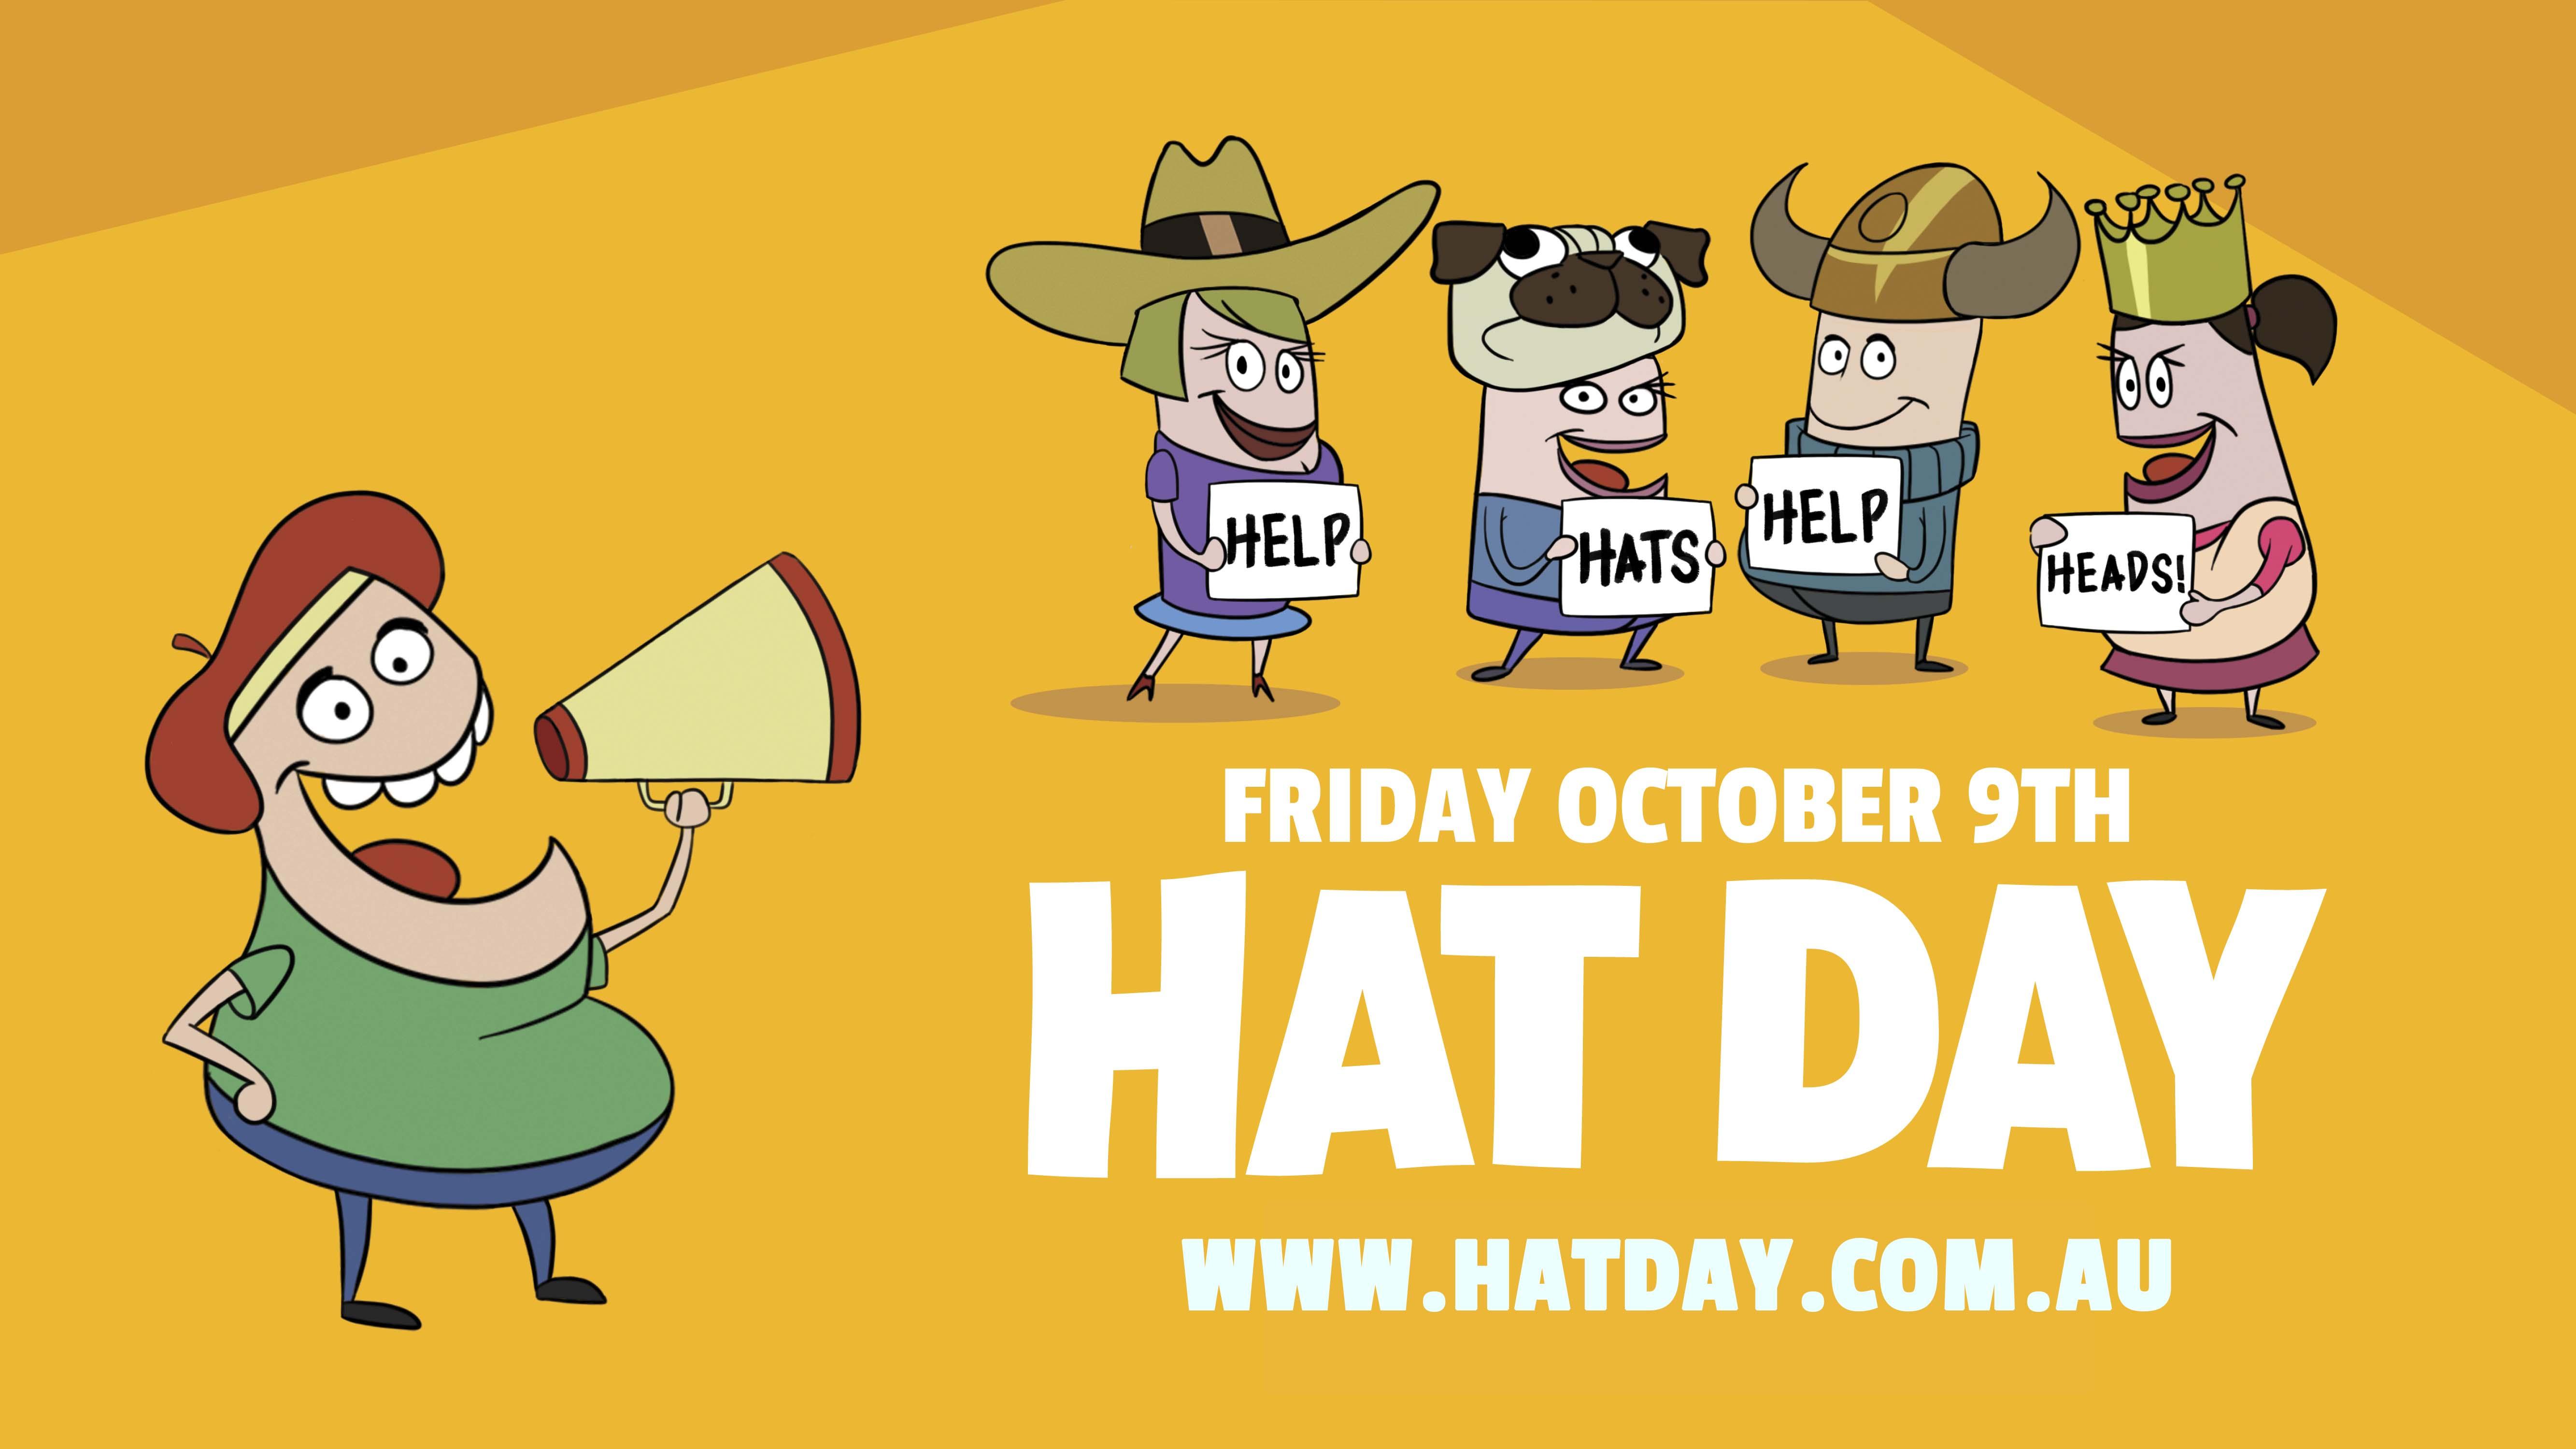 help hats help heads on world mental health day rotary